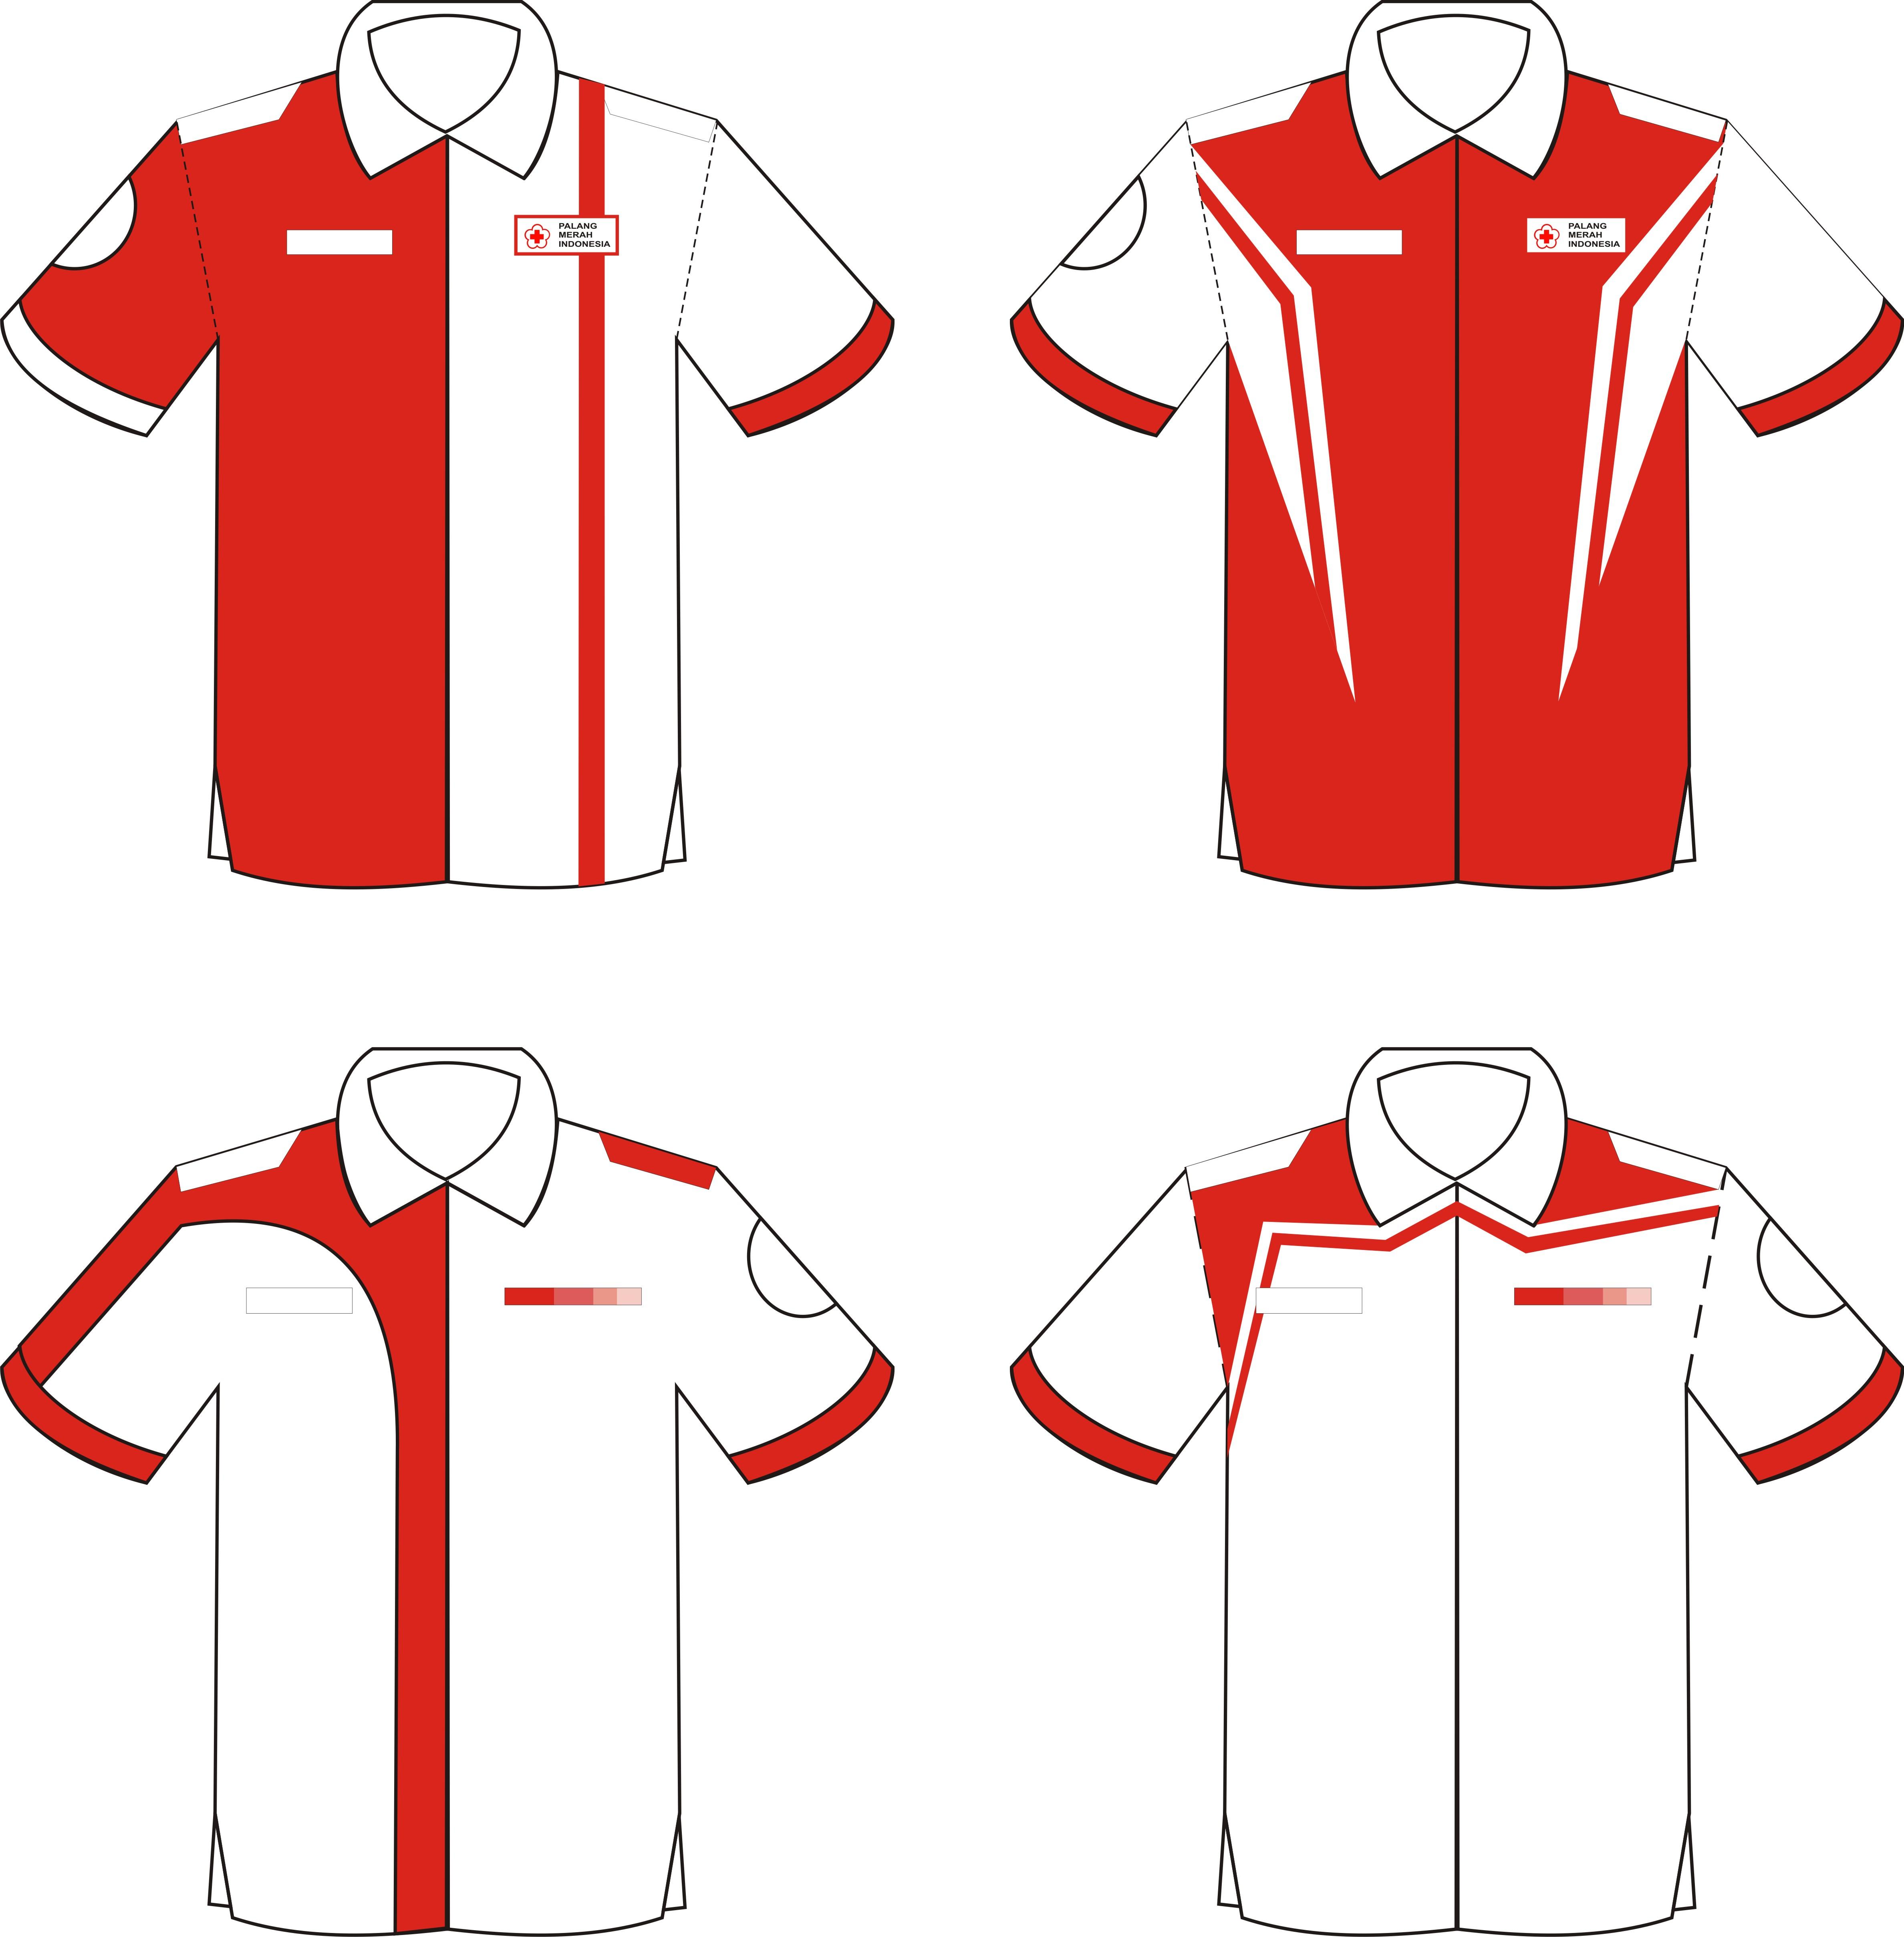 Design Seragam | Korps Sukarela PMI Kab. Sukoharjo